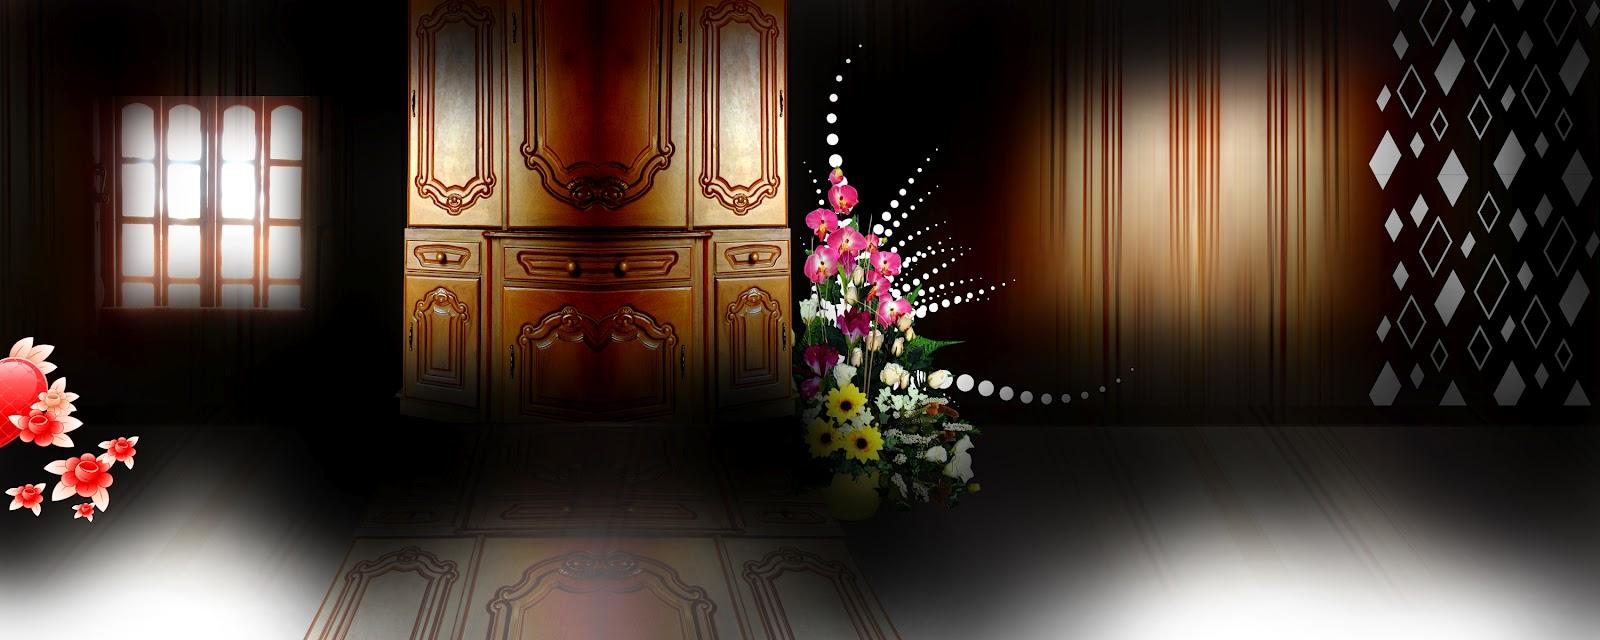 Karizma album hd joy studio design gallery best design - Latest Karishma Album Backgrounds Psd Karishma Album Design Karizma Album Background Frames Karizma Album Design Karizma Album Templates Lovely Wedding